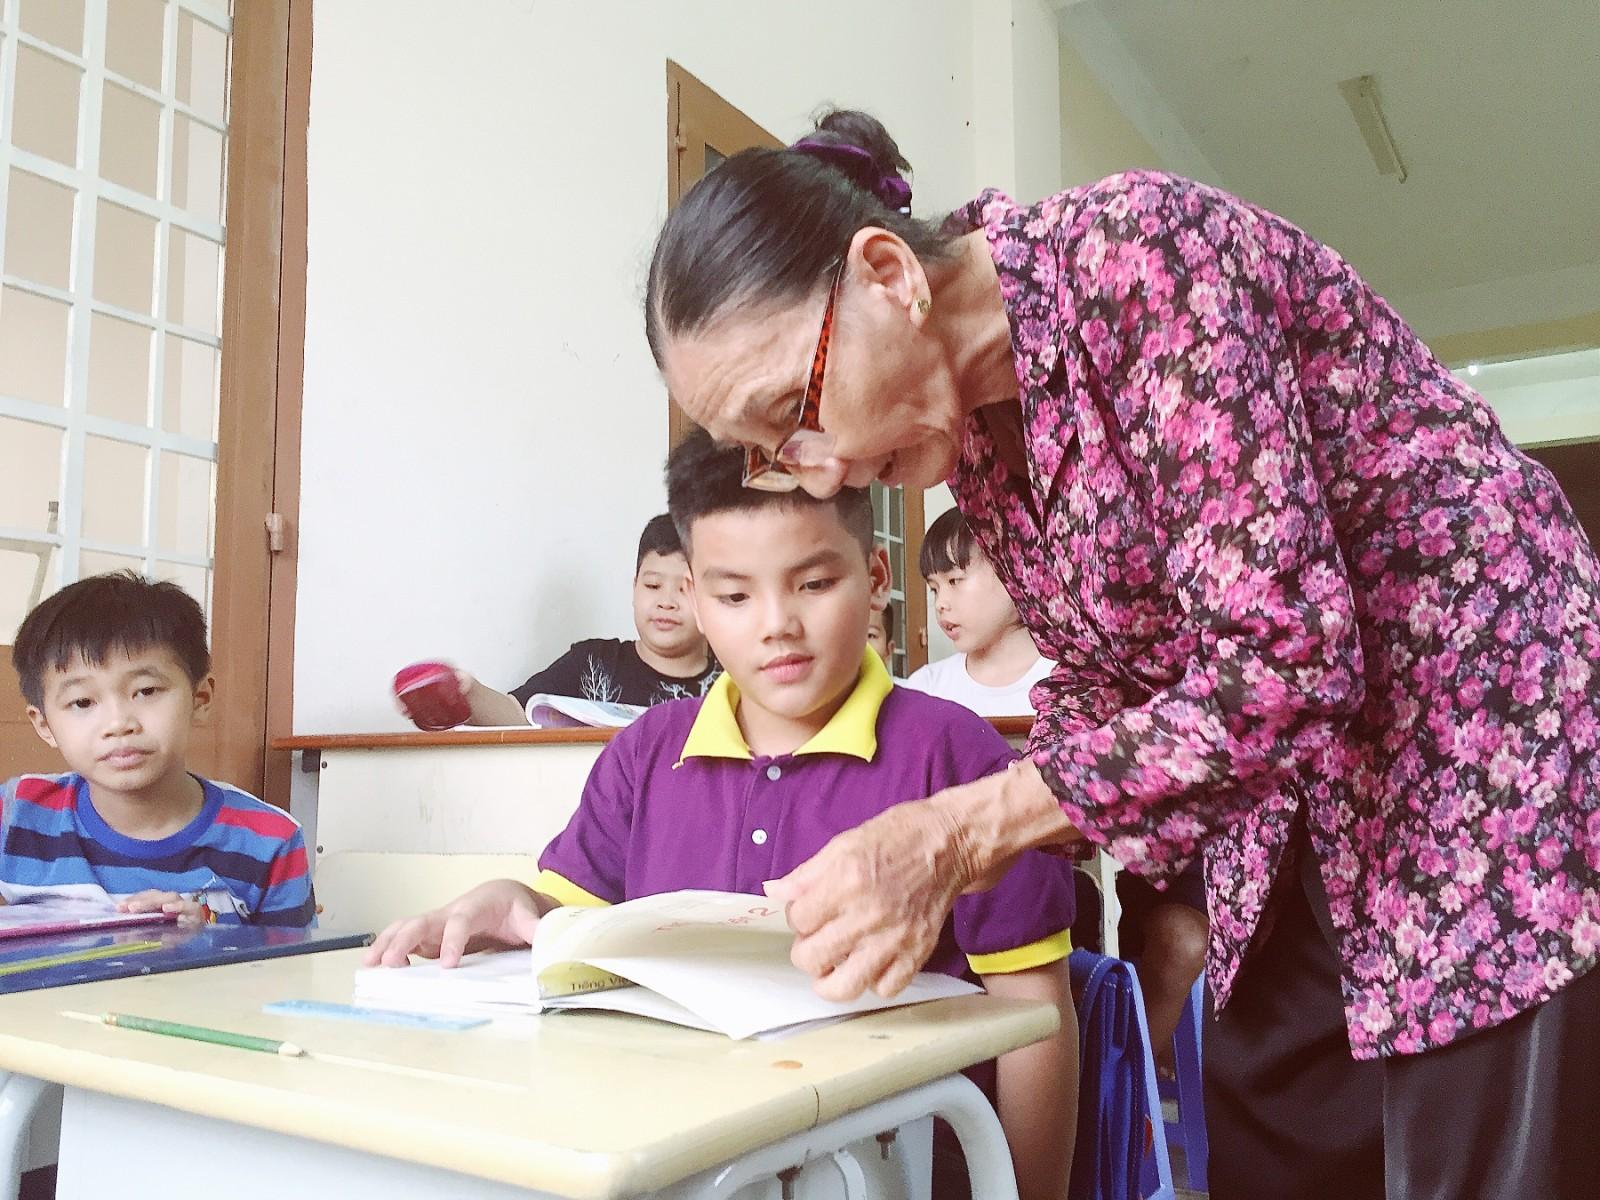 lottery ticket seller_teaching poor children